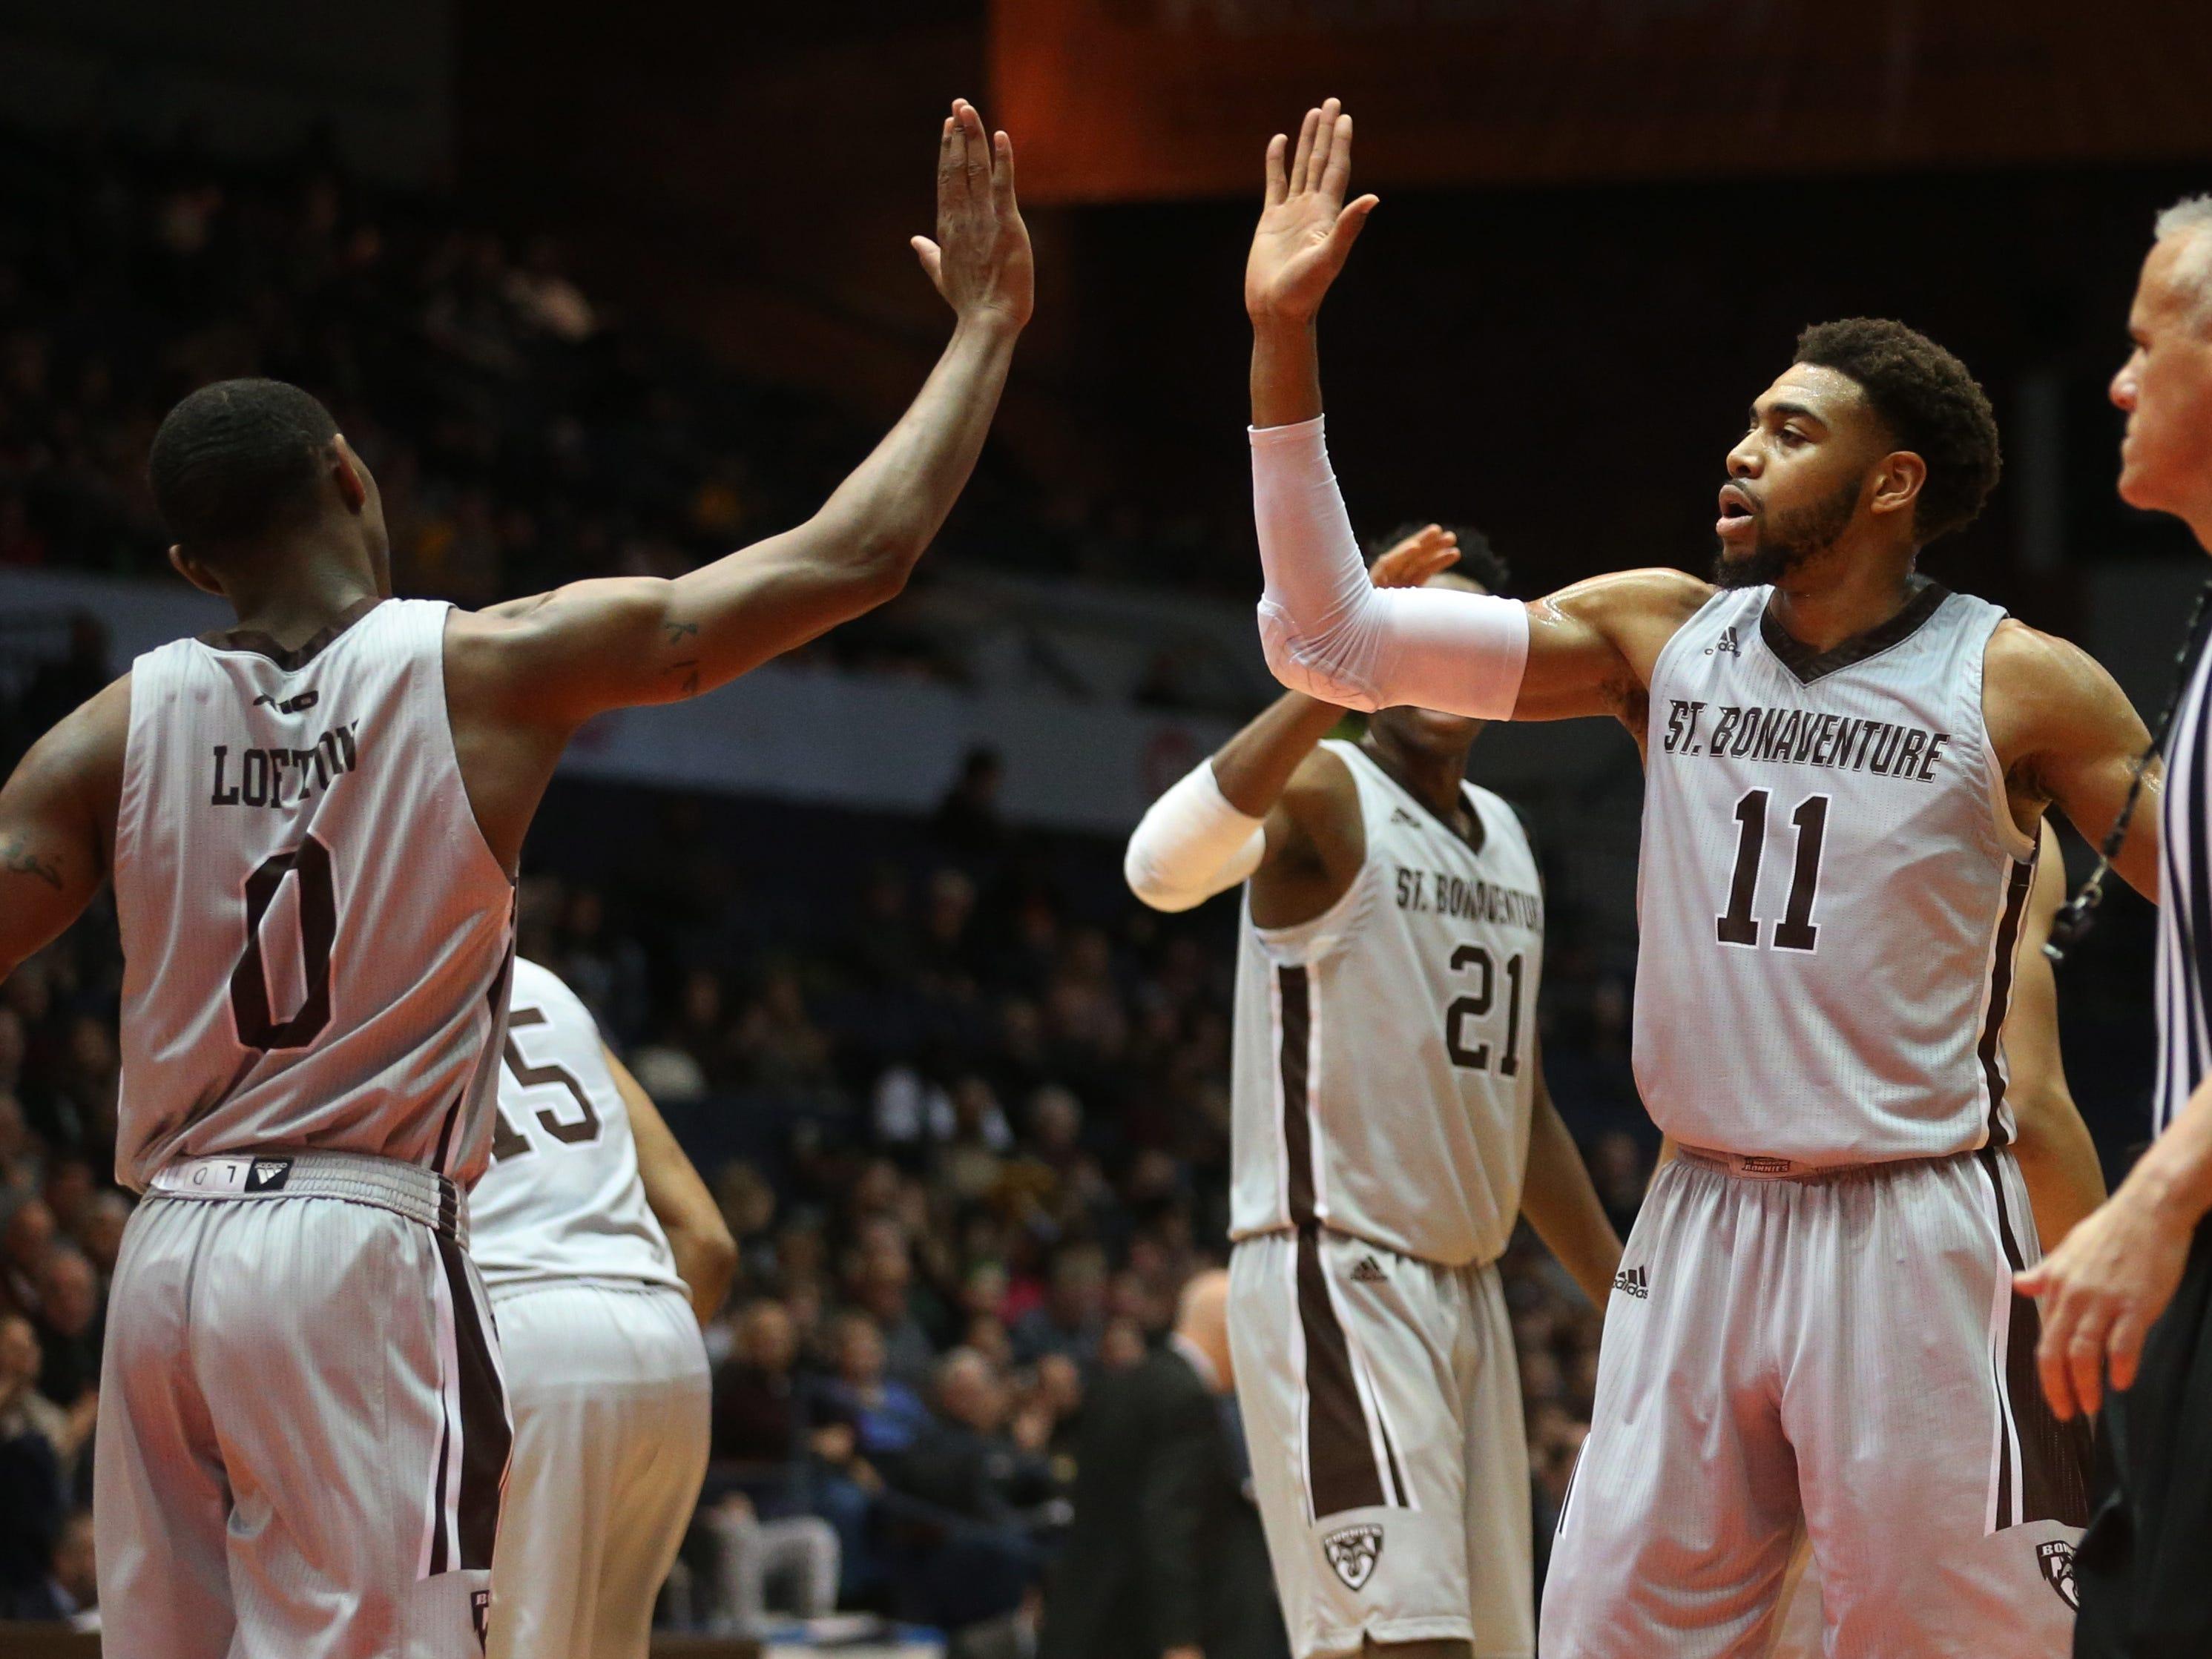 St. Bonaventure's Kyle Lofton, left, celebrates his basket with teammate Courtney Stockard.